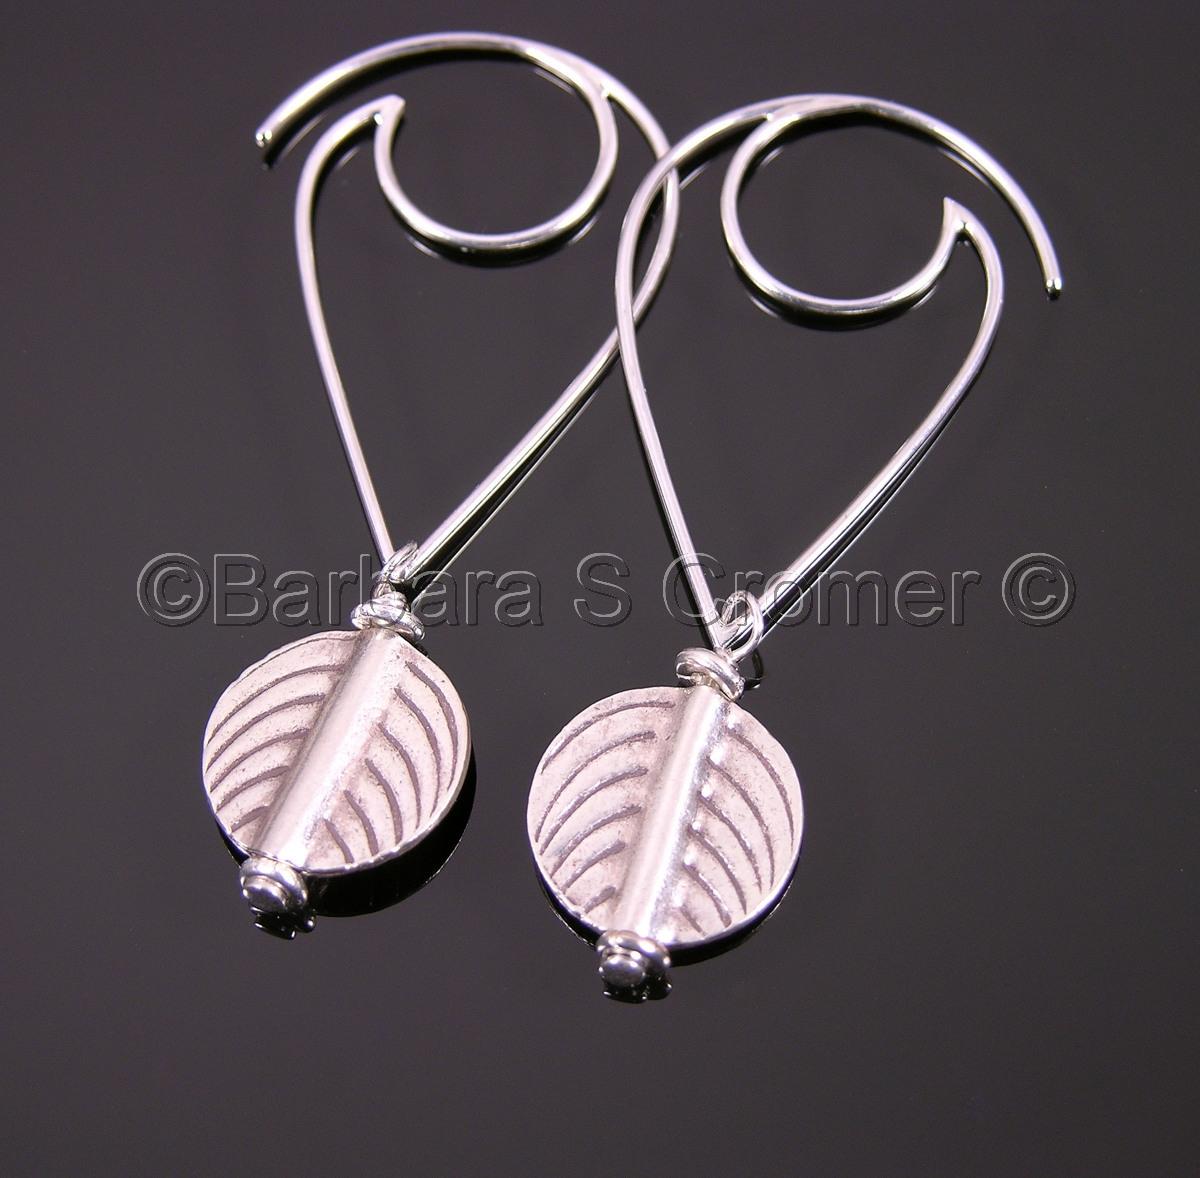 Modern silver leaf earrings (large view)